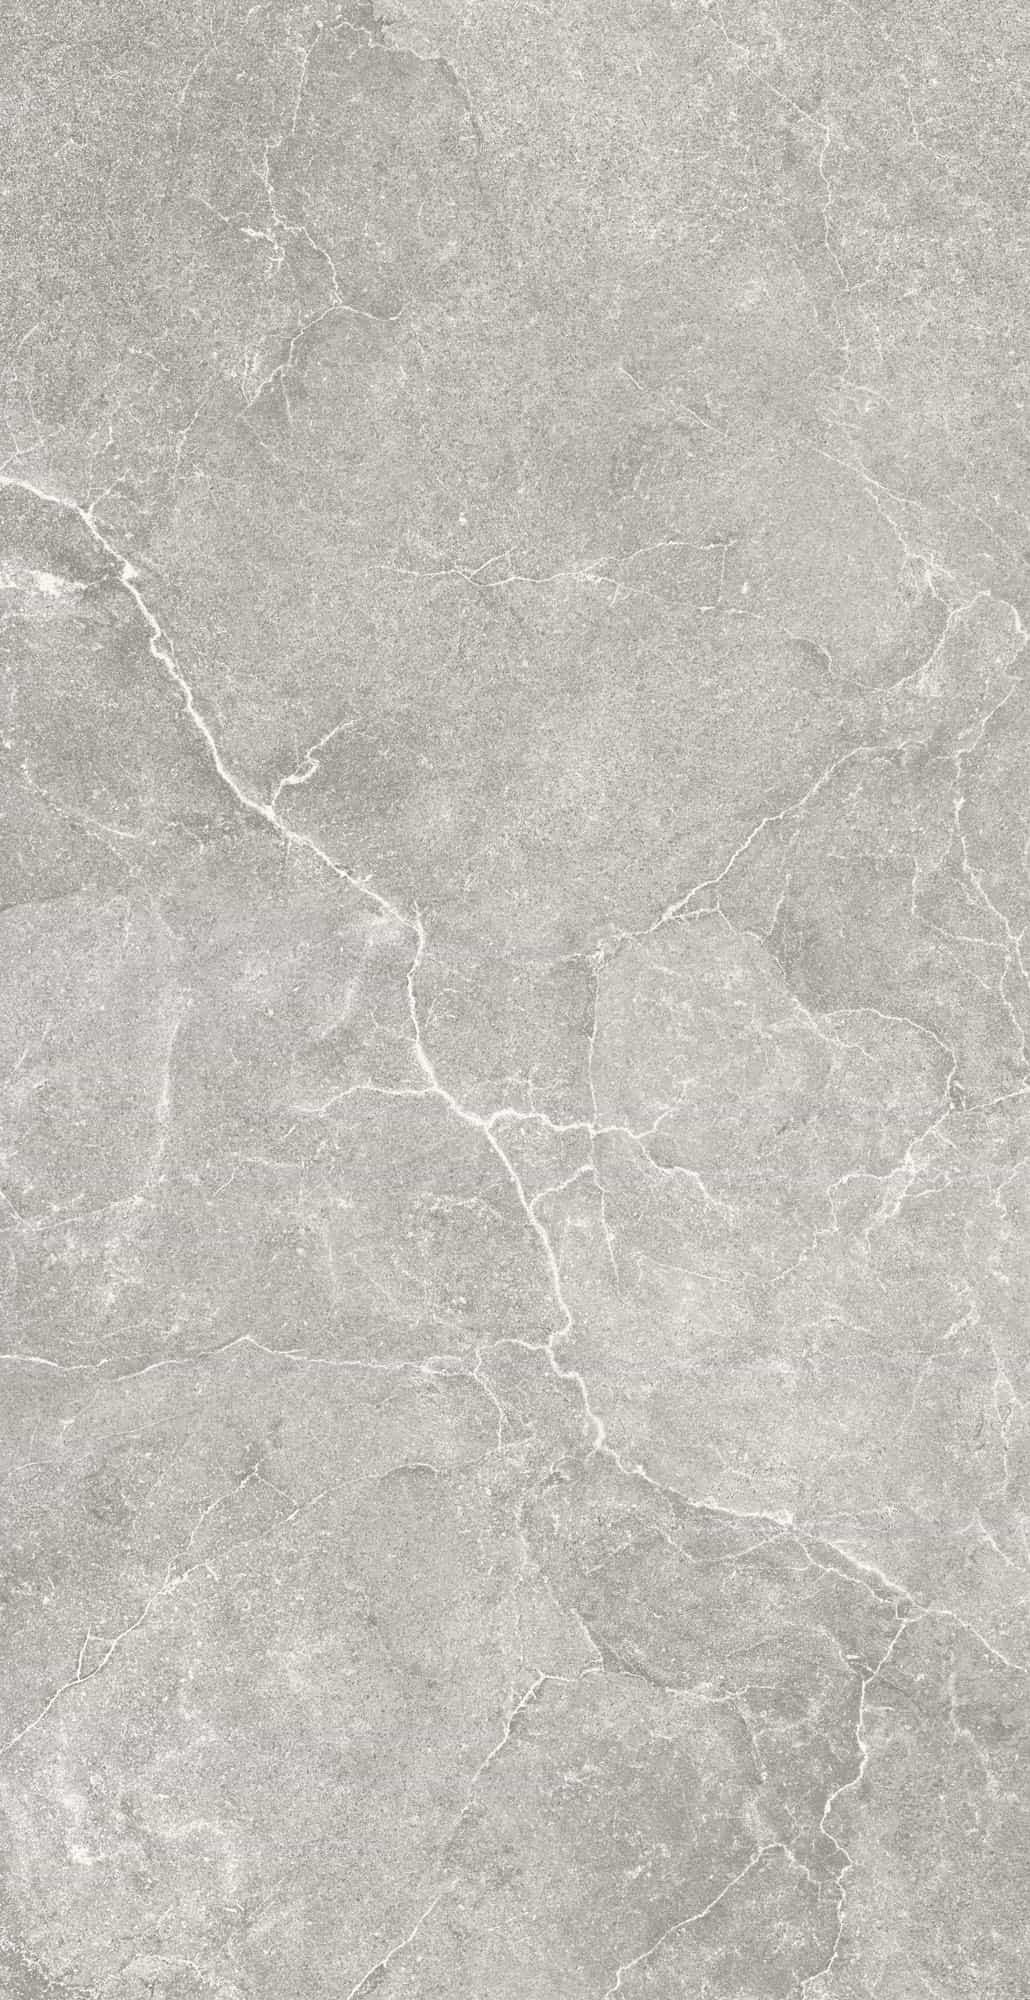 Wandtegels 90x90 - Lithos Stone - Naturale